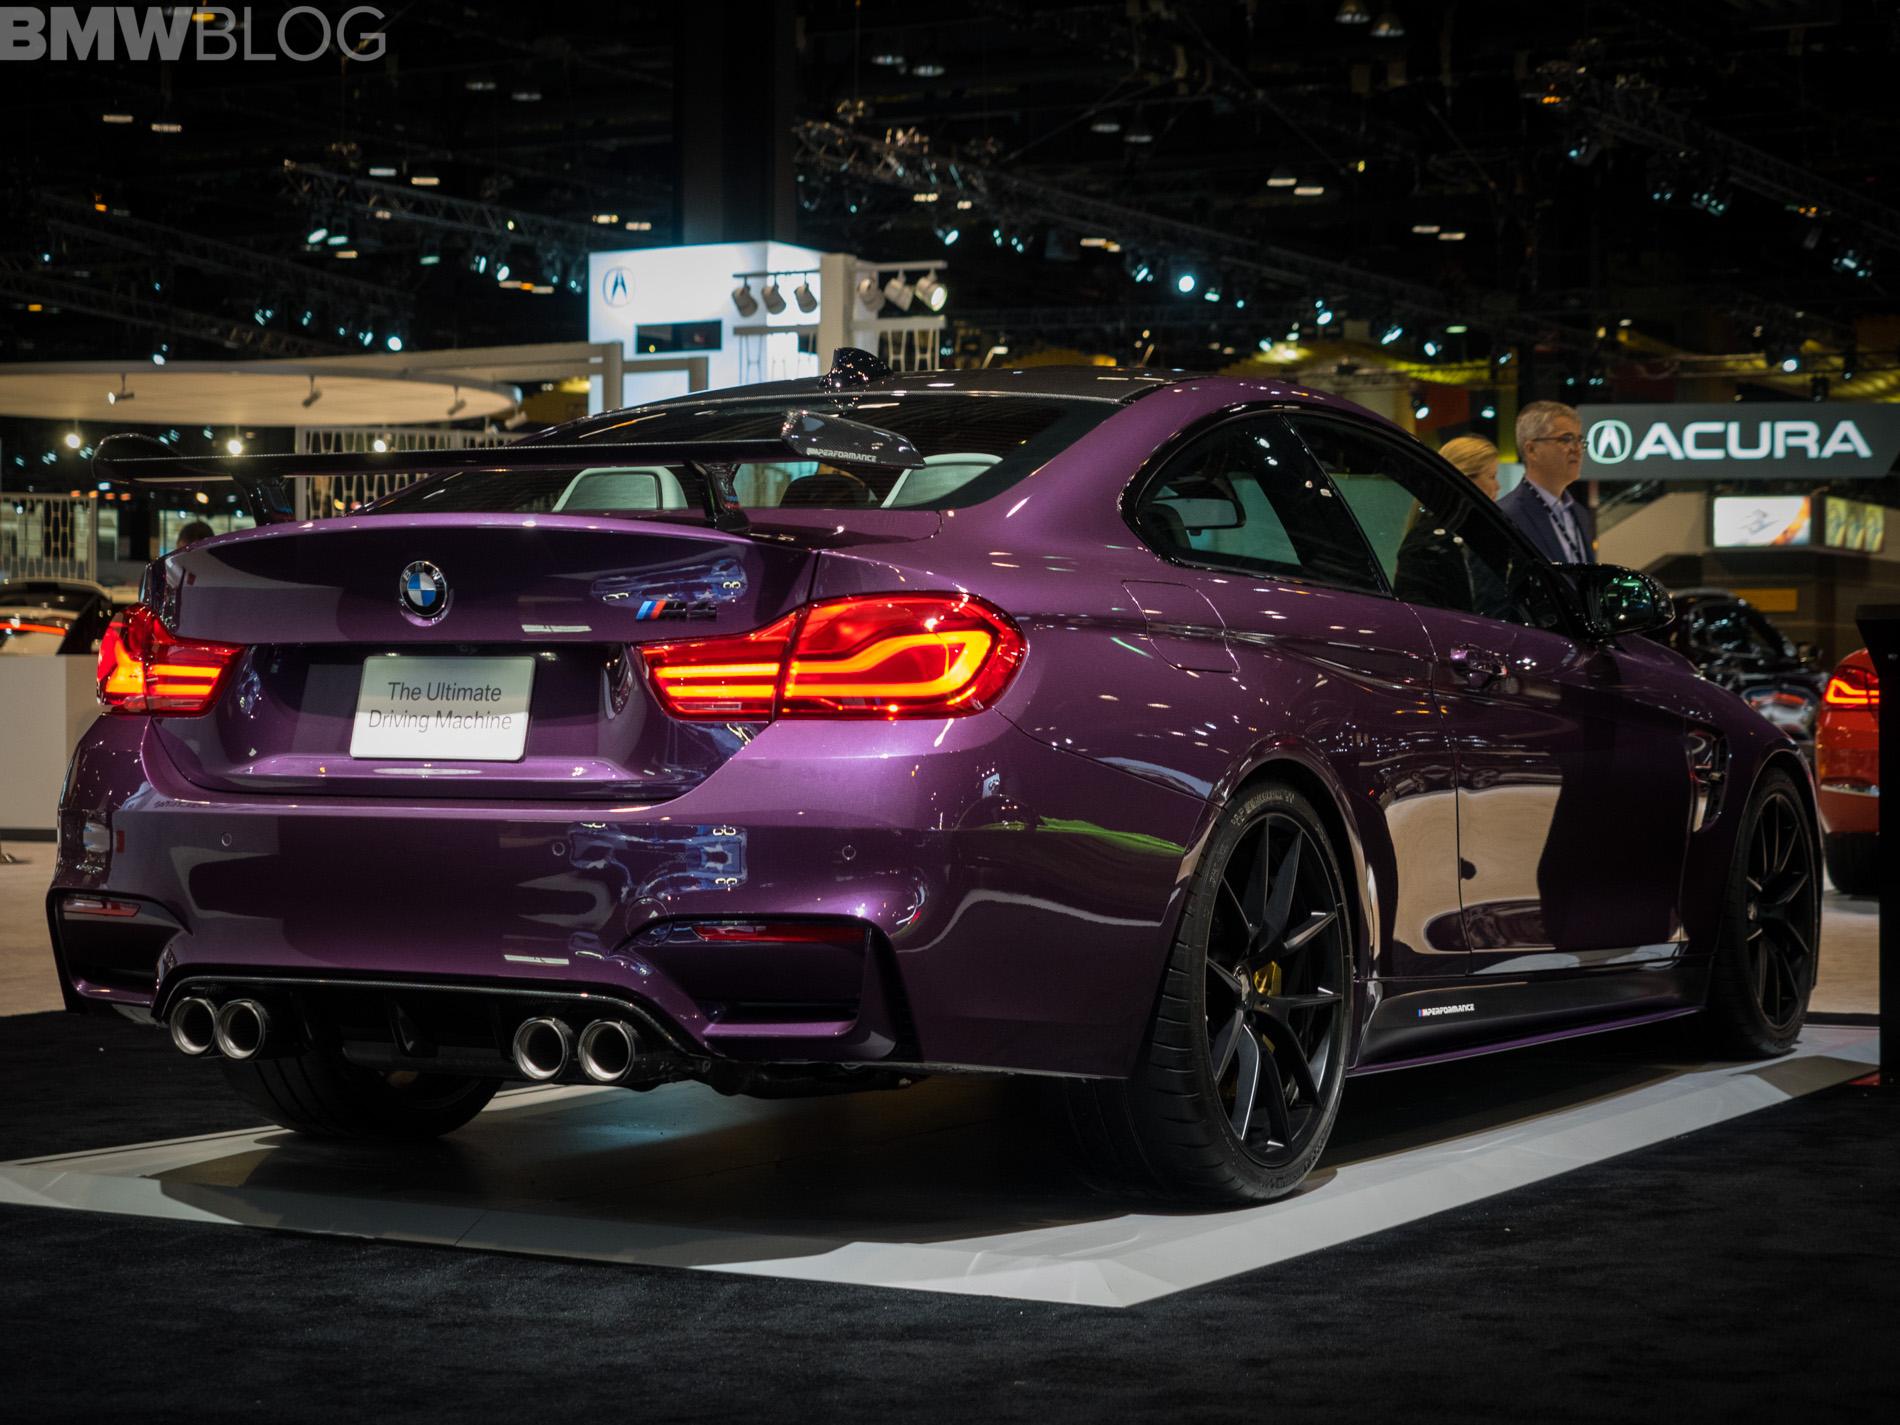 2018 Chicago Auto Show Bmw M4 In Purple Silk With M